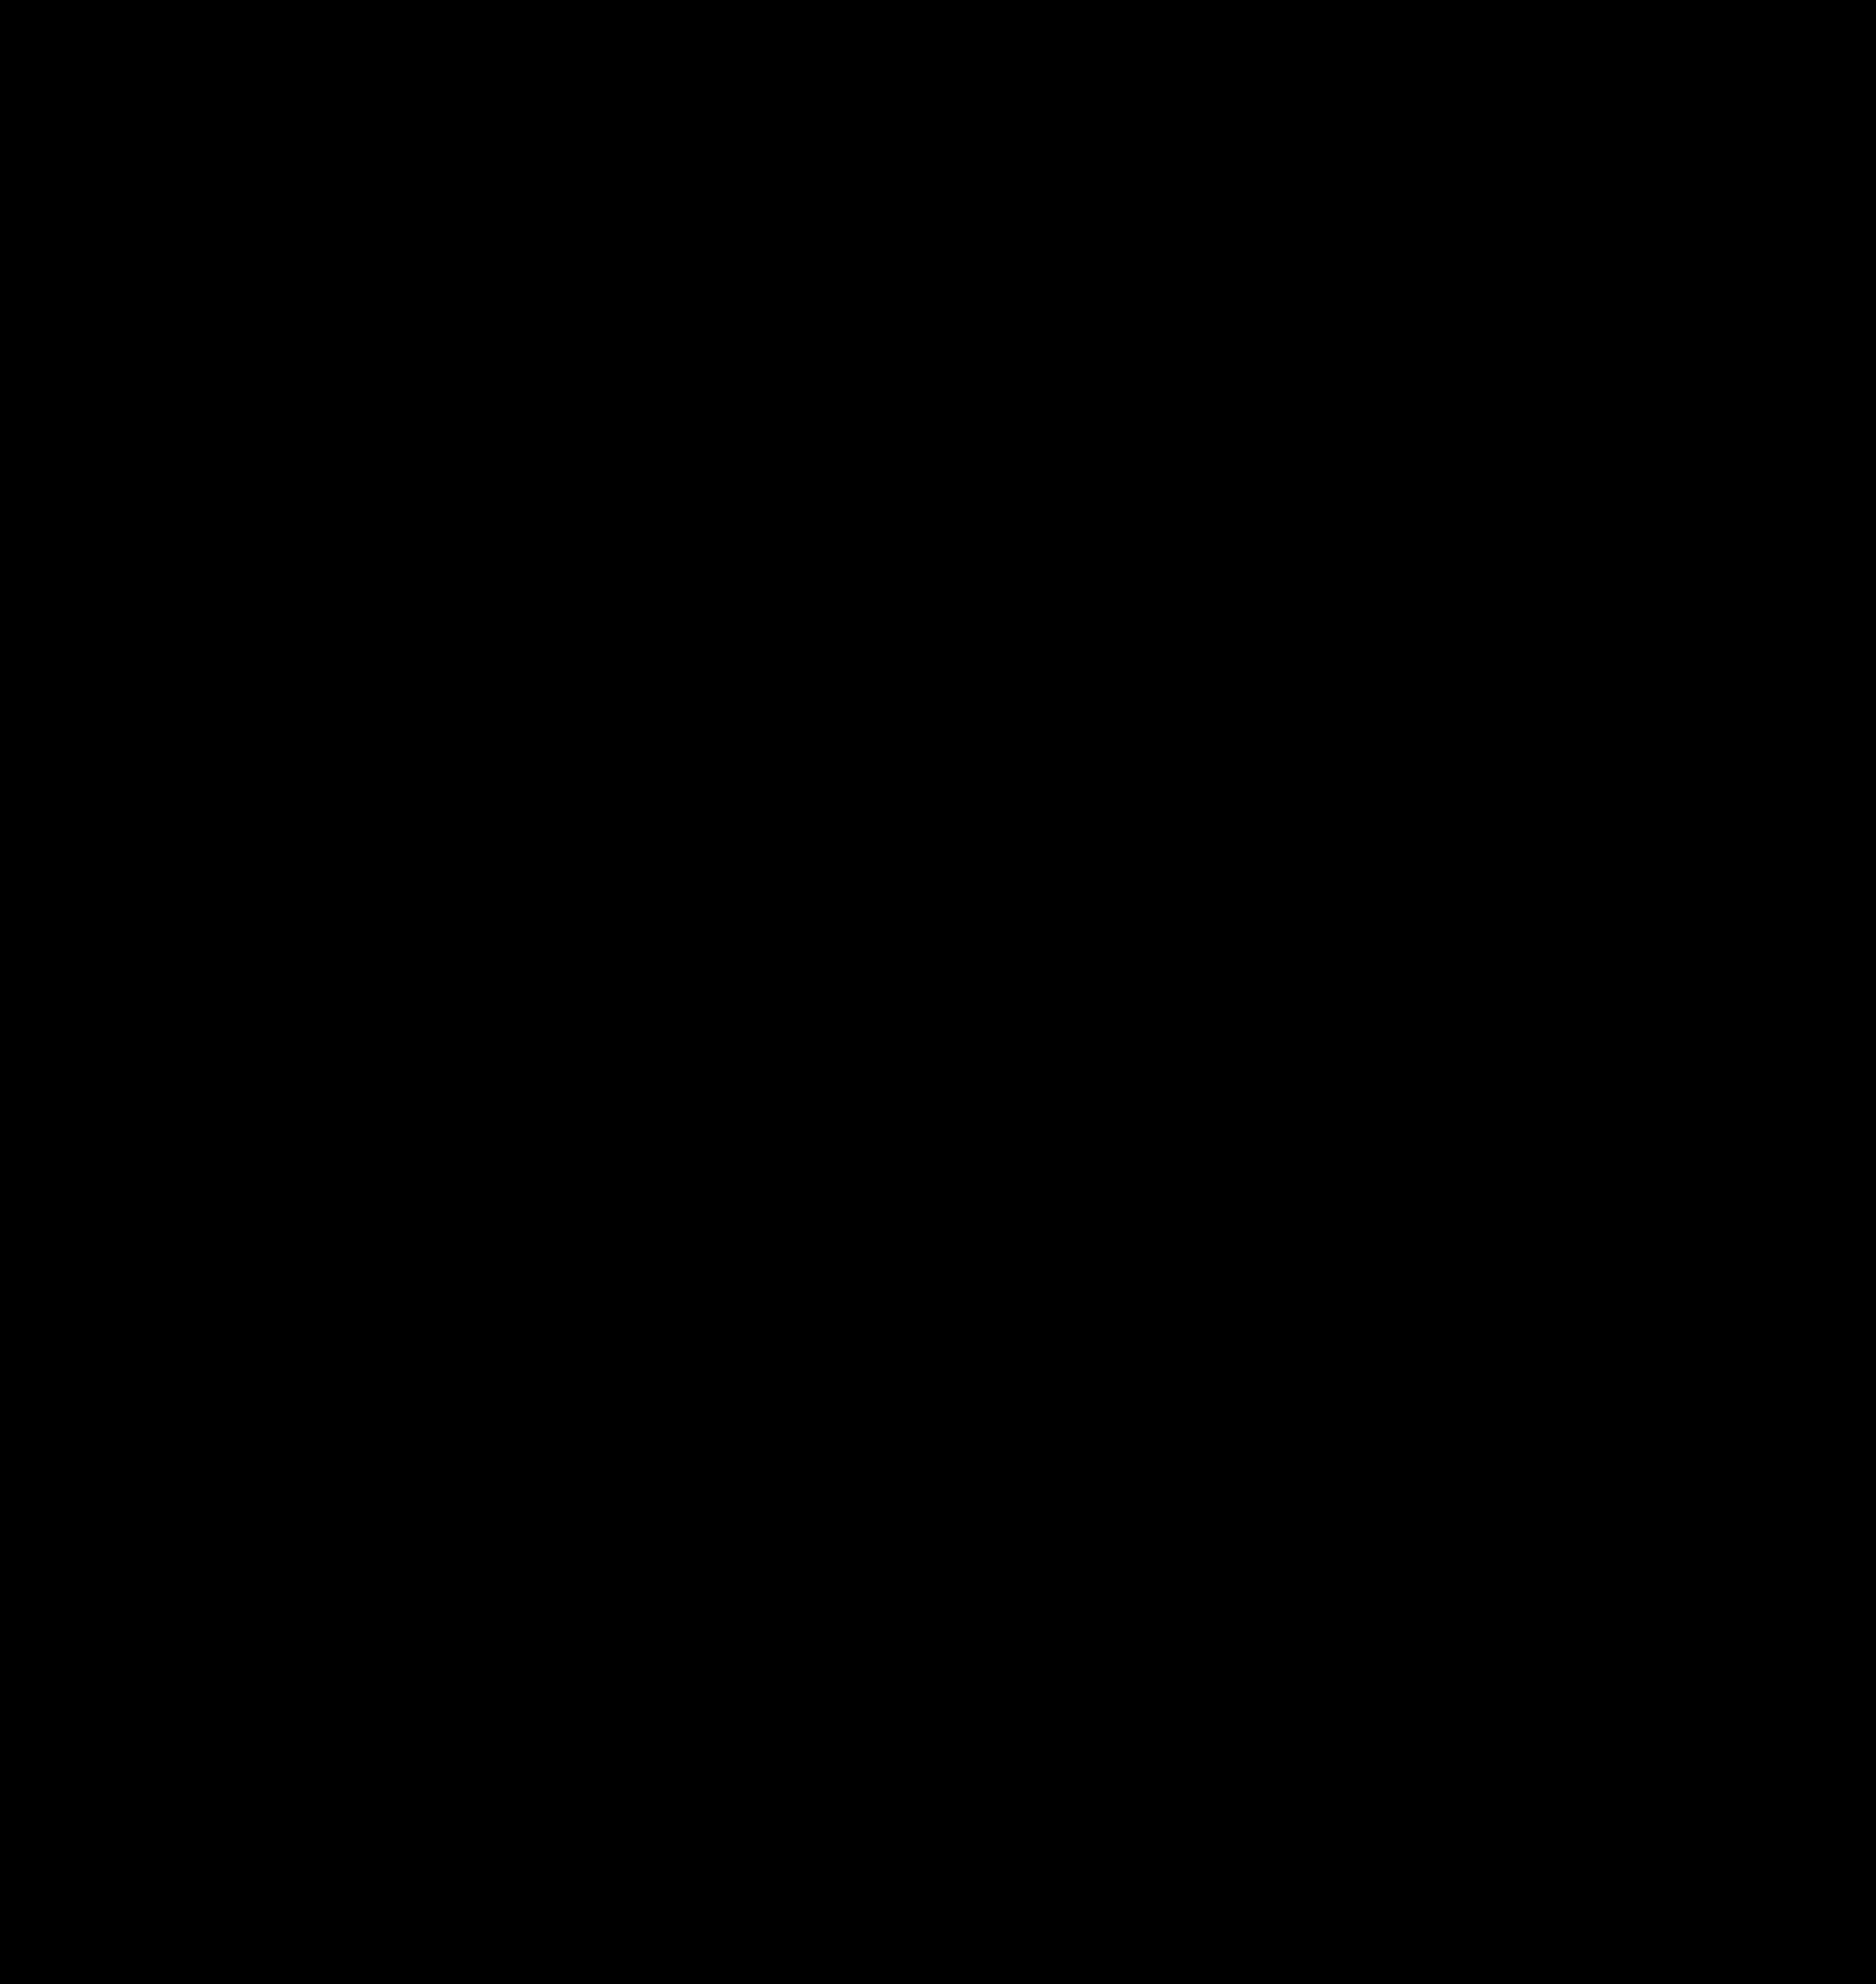 2190x2316 Clipart